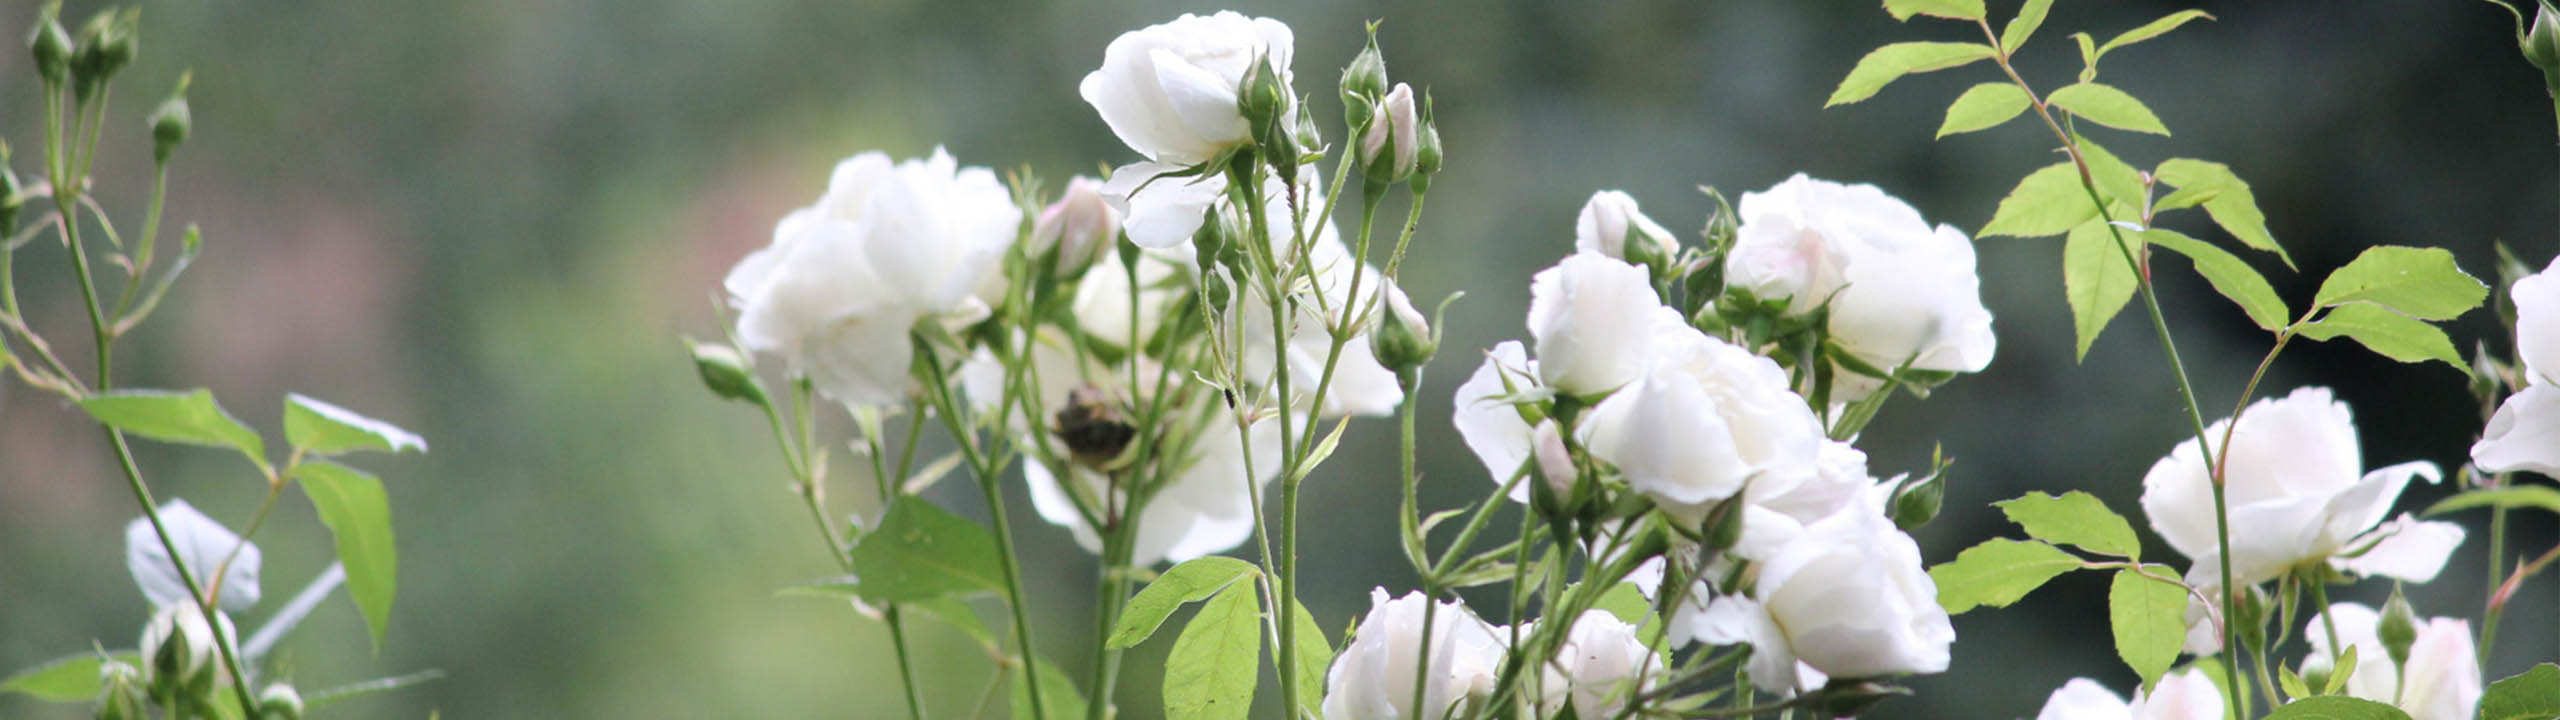 WhiteRose's Garden